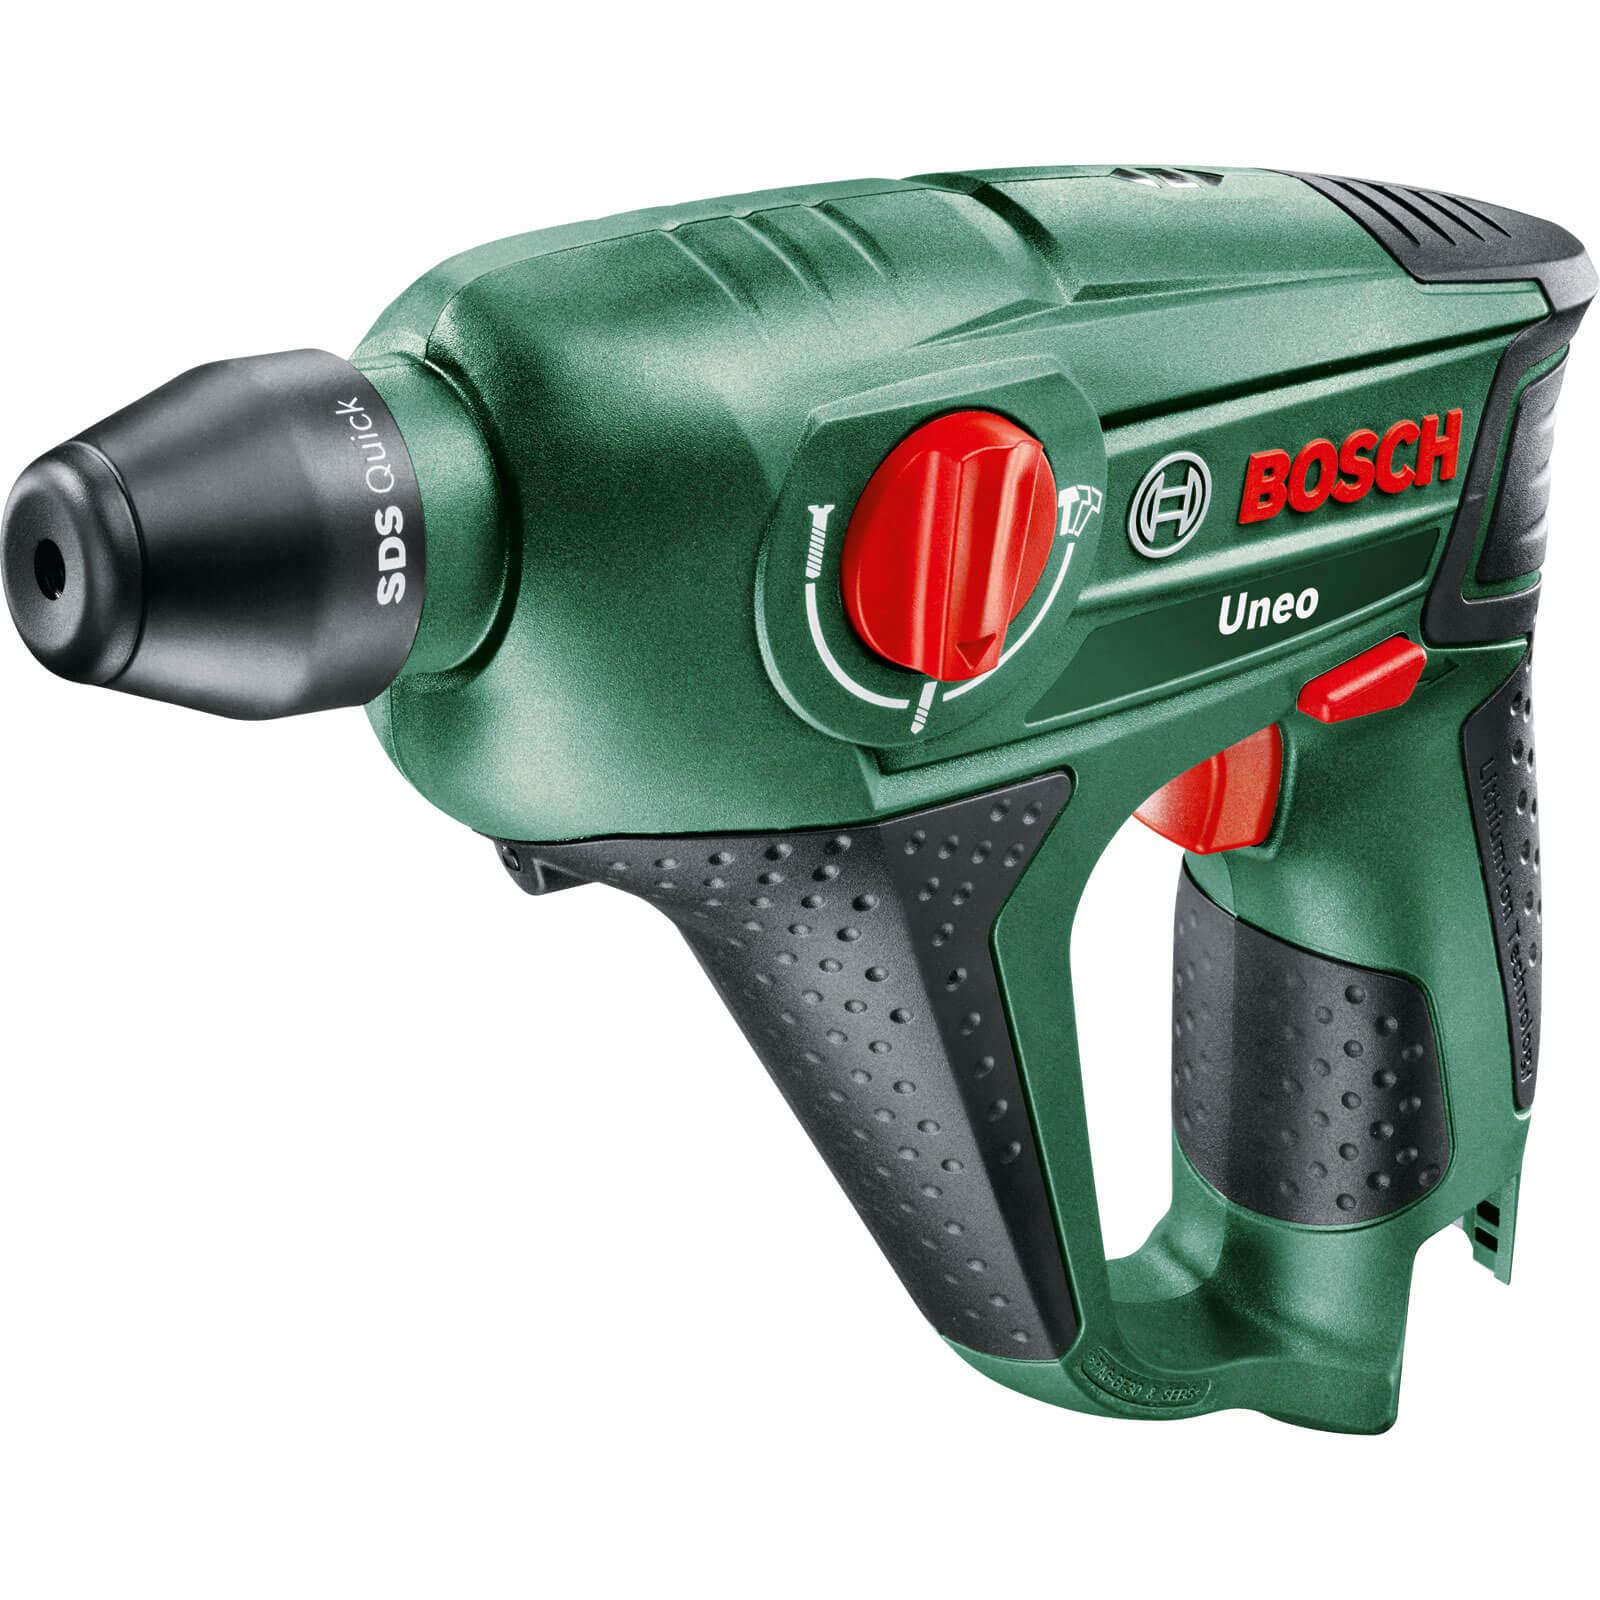 Bosch UNEO 10.8 LI2 10.8v Cordless Hammer Drill No Batteries No Charger No Case